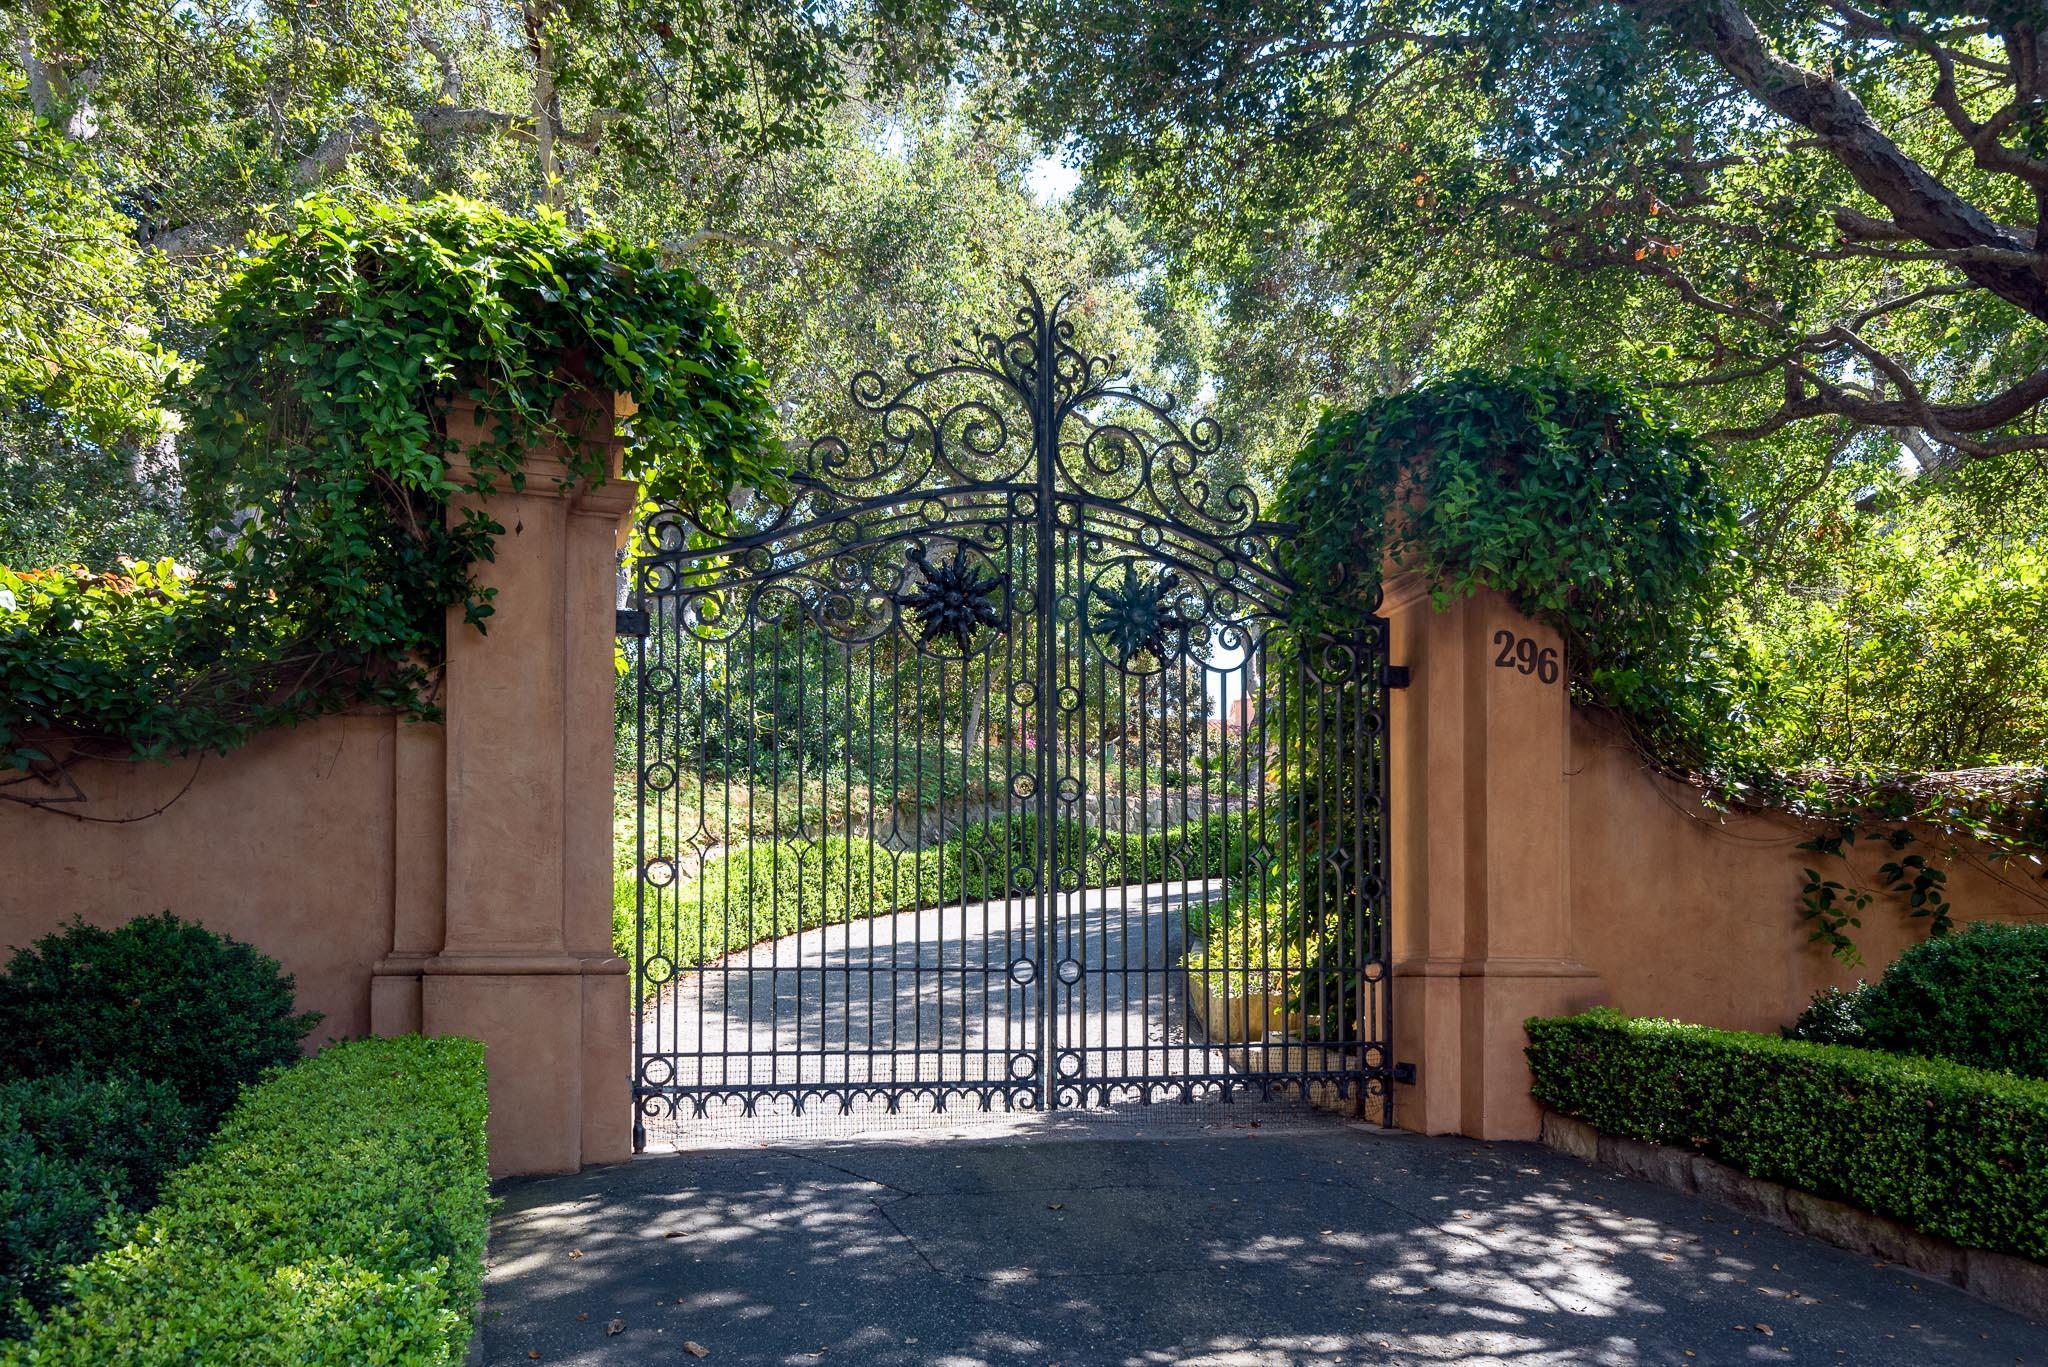 296 Las Entradas Dr Montecito, CA 93108